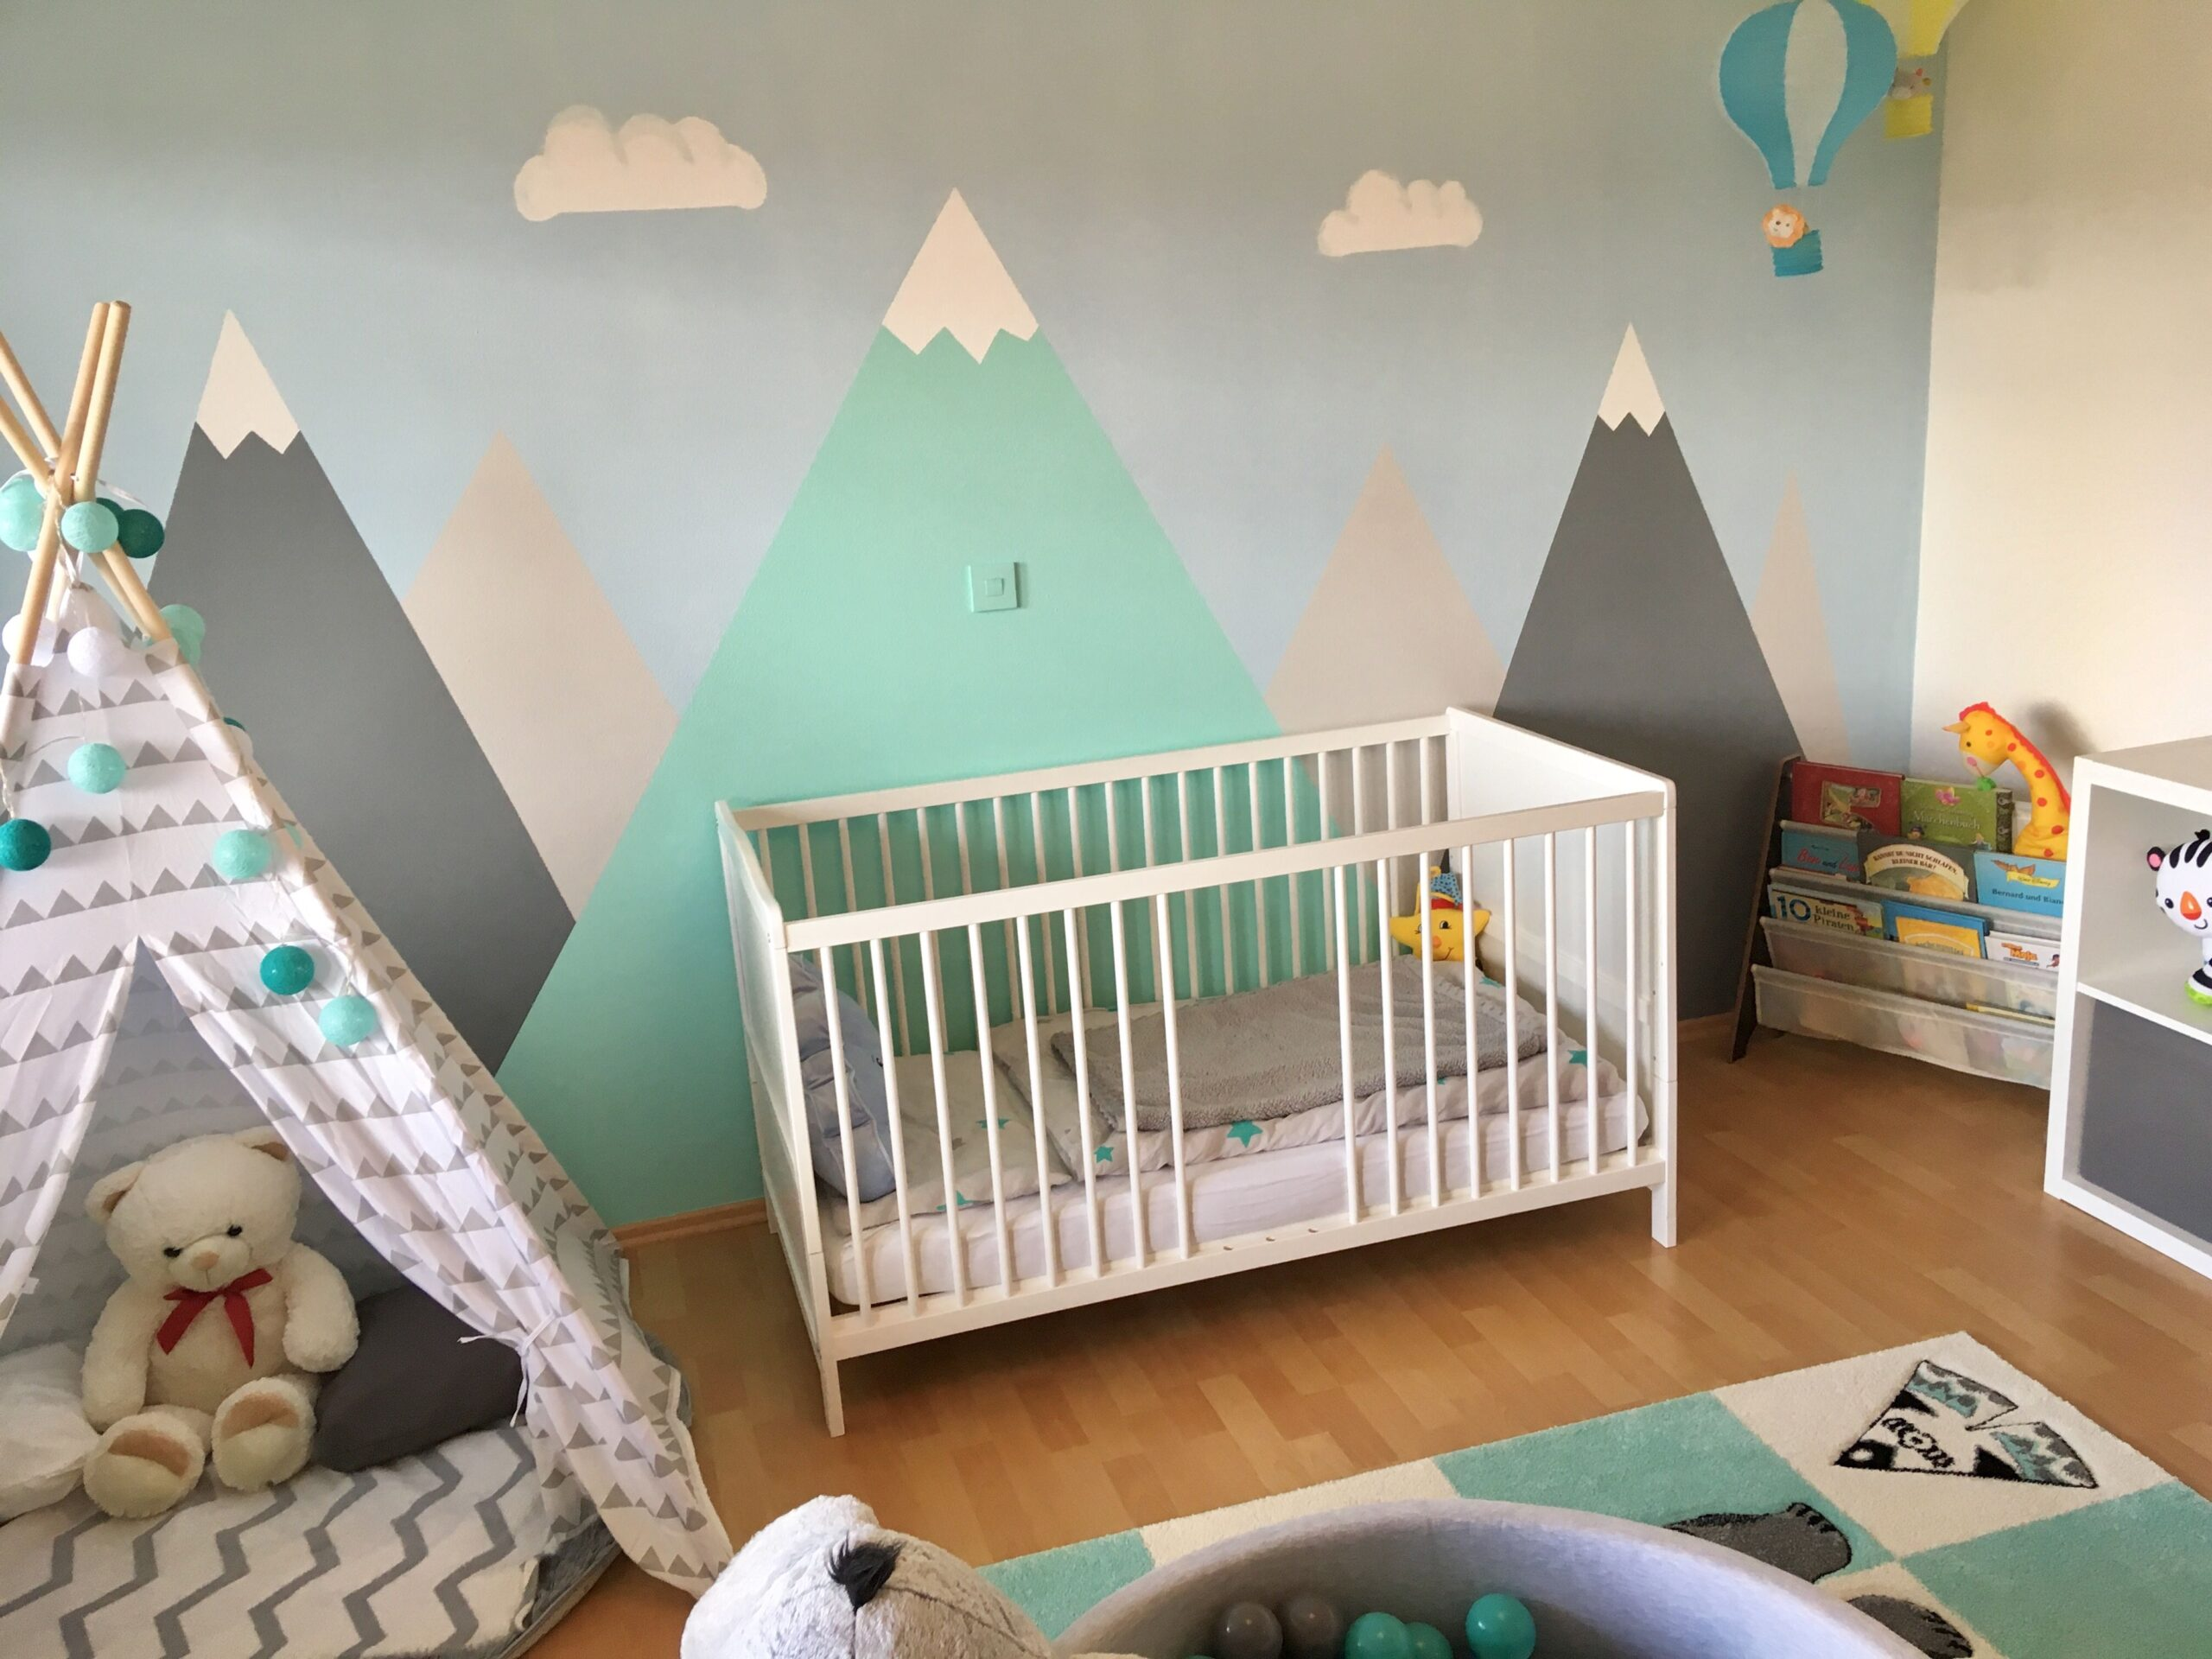 Full Size of Kinderzimmer Jungs Junge Berge Mountains Heiluftballon Tipi Indianer Sofa Regal Regale Weiß Kinderzimmer Kinderzimmer Jungs